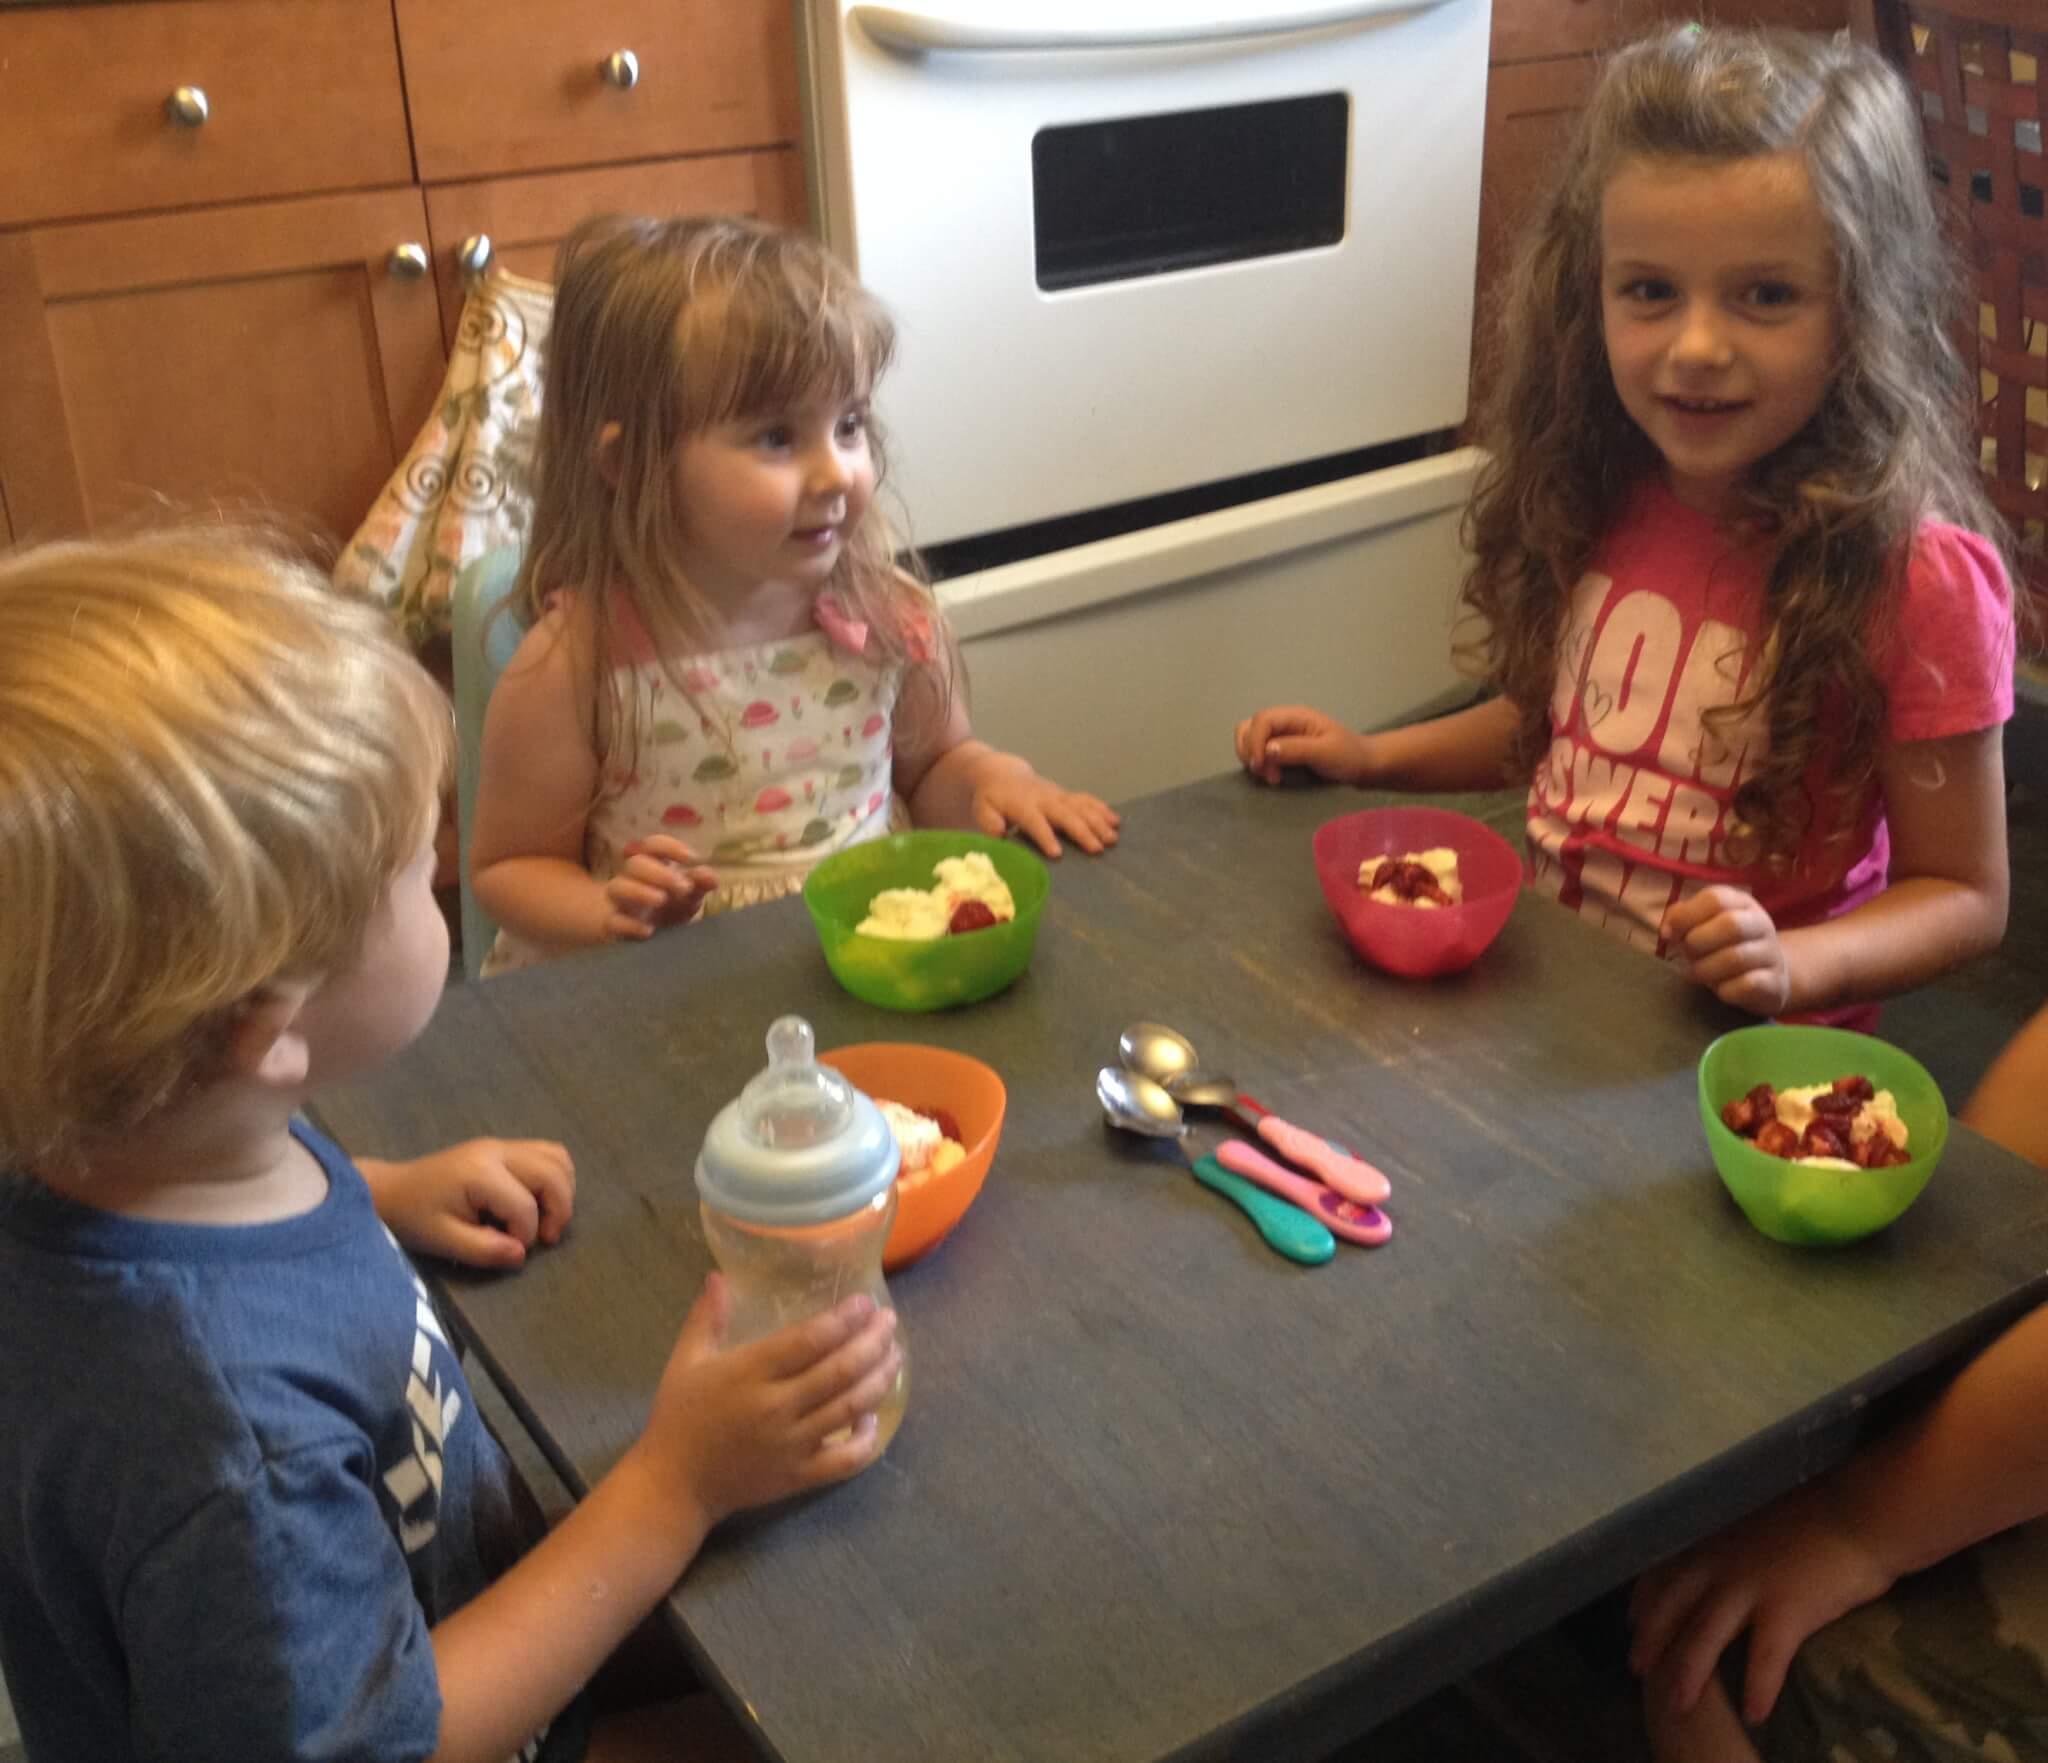 tennis strawberries and ice cream preschool snack